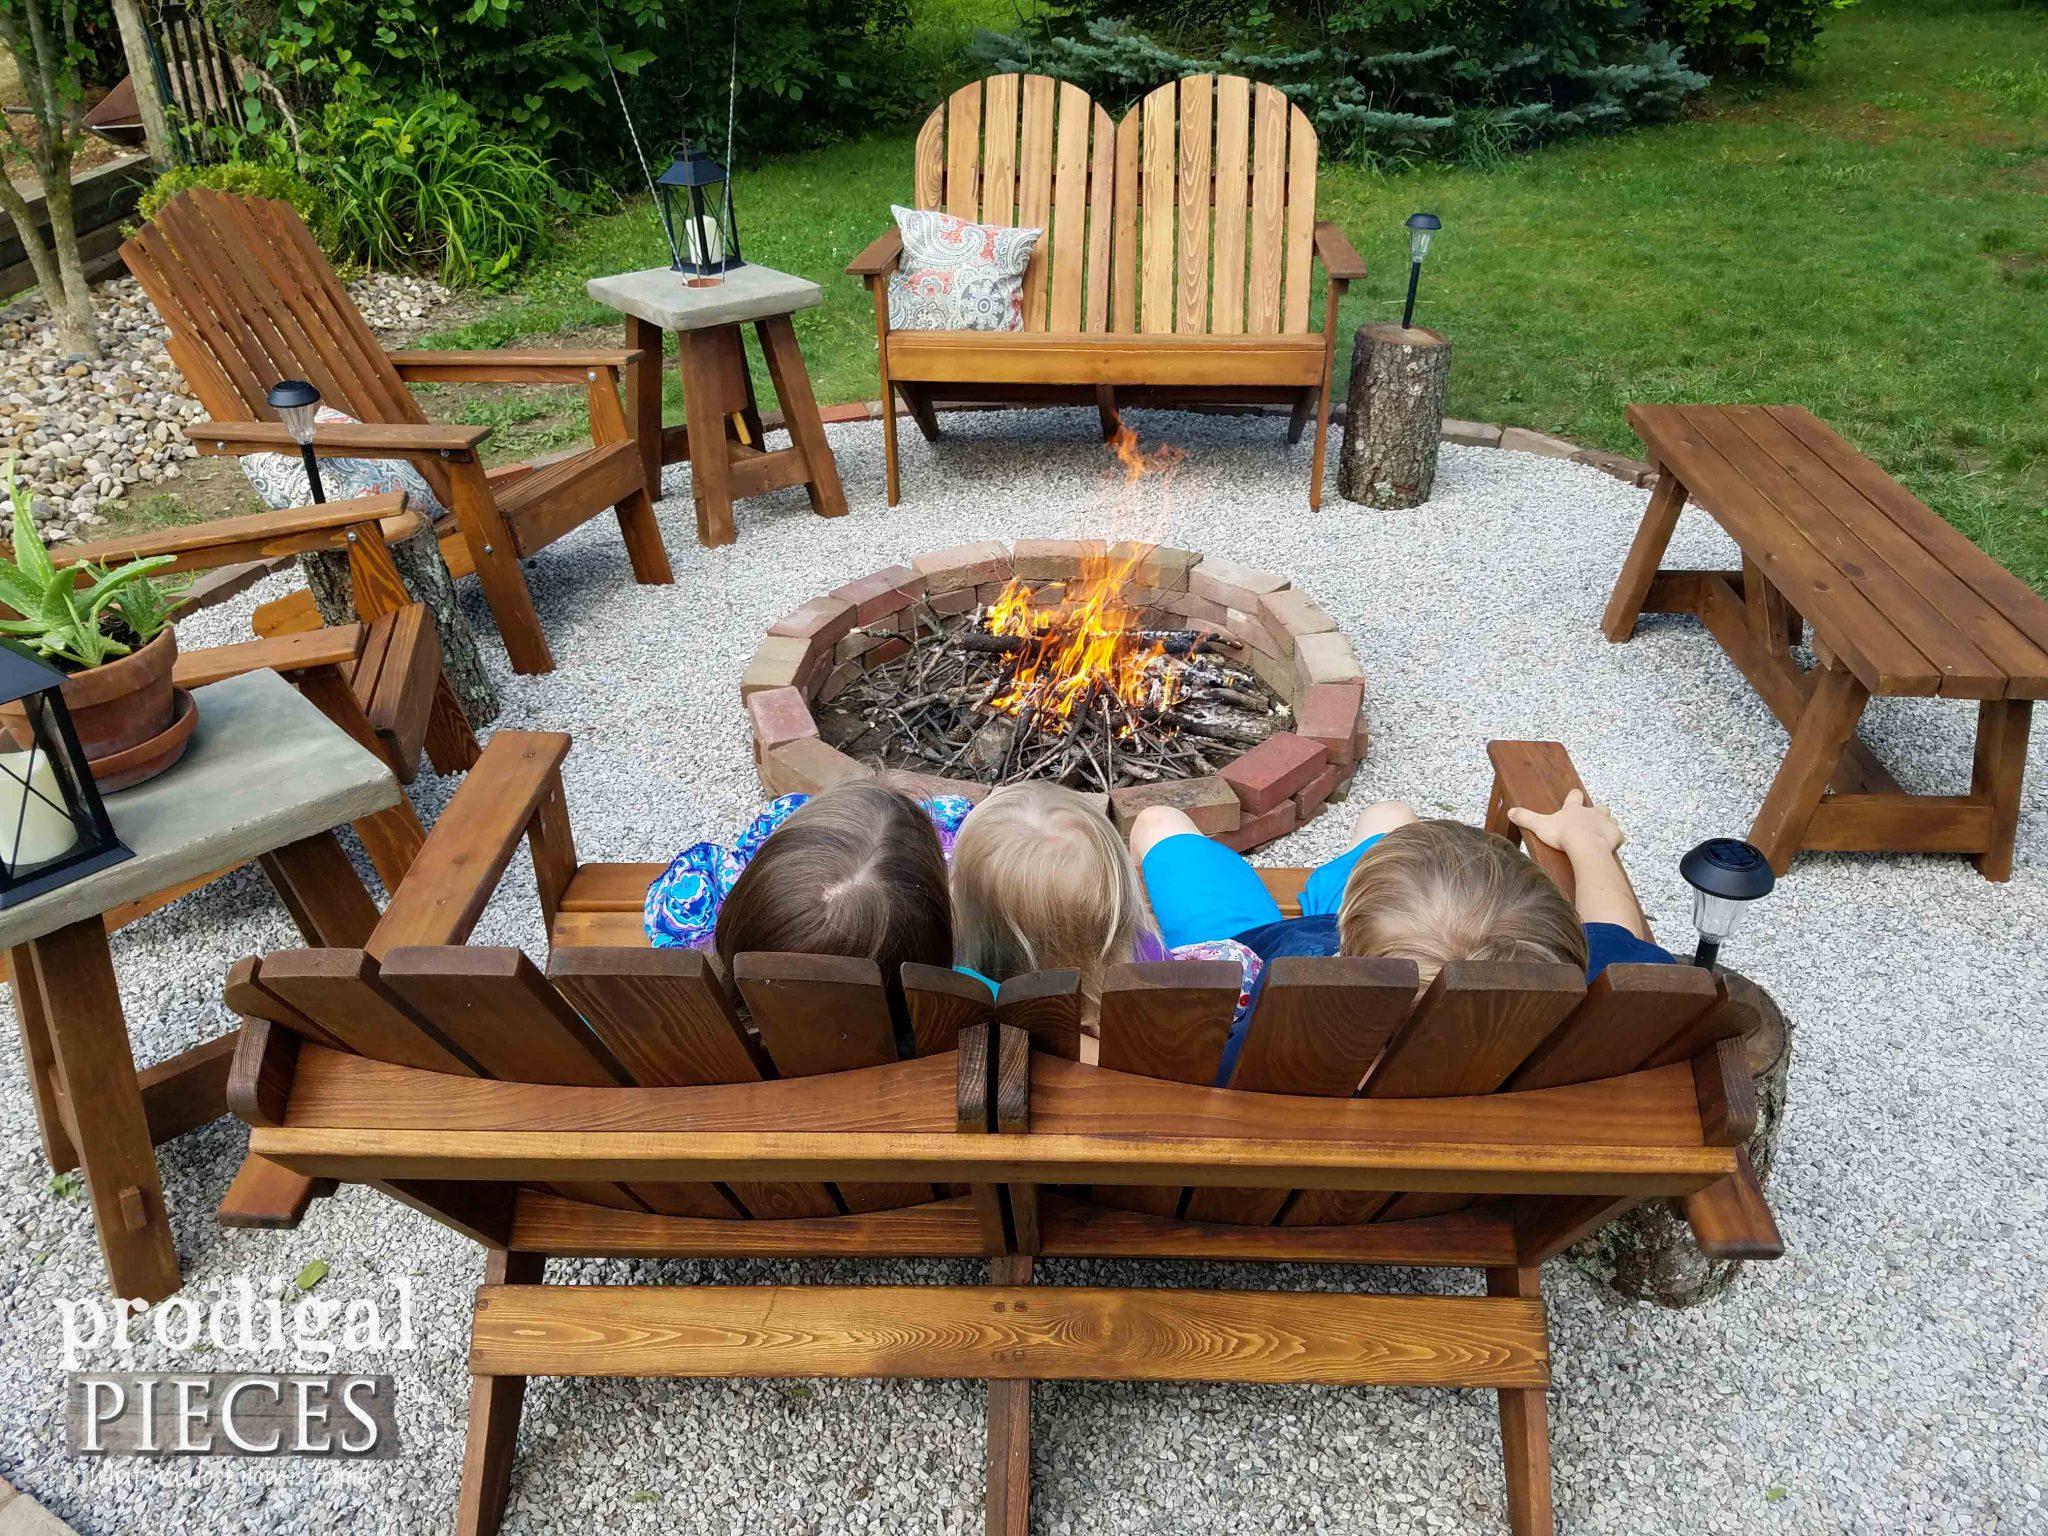 diy fire pit backyard budget decor prodigal pieces